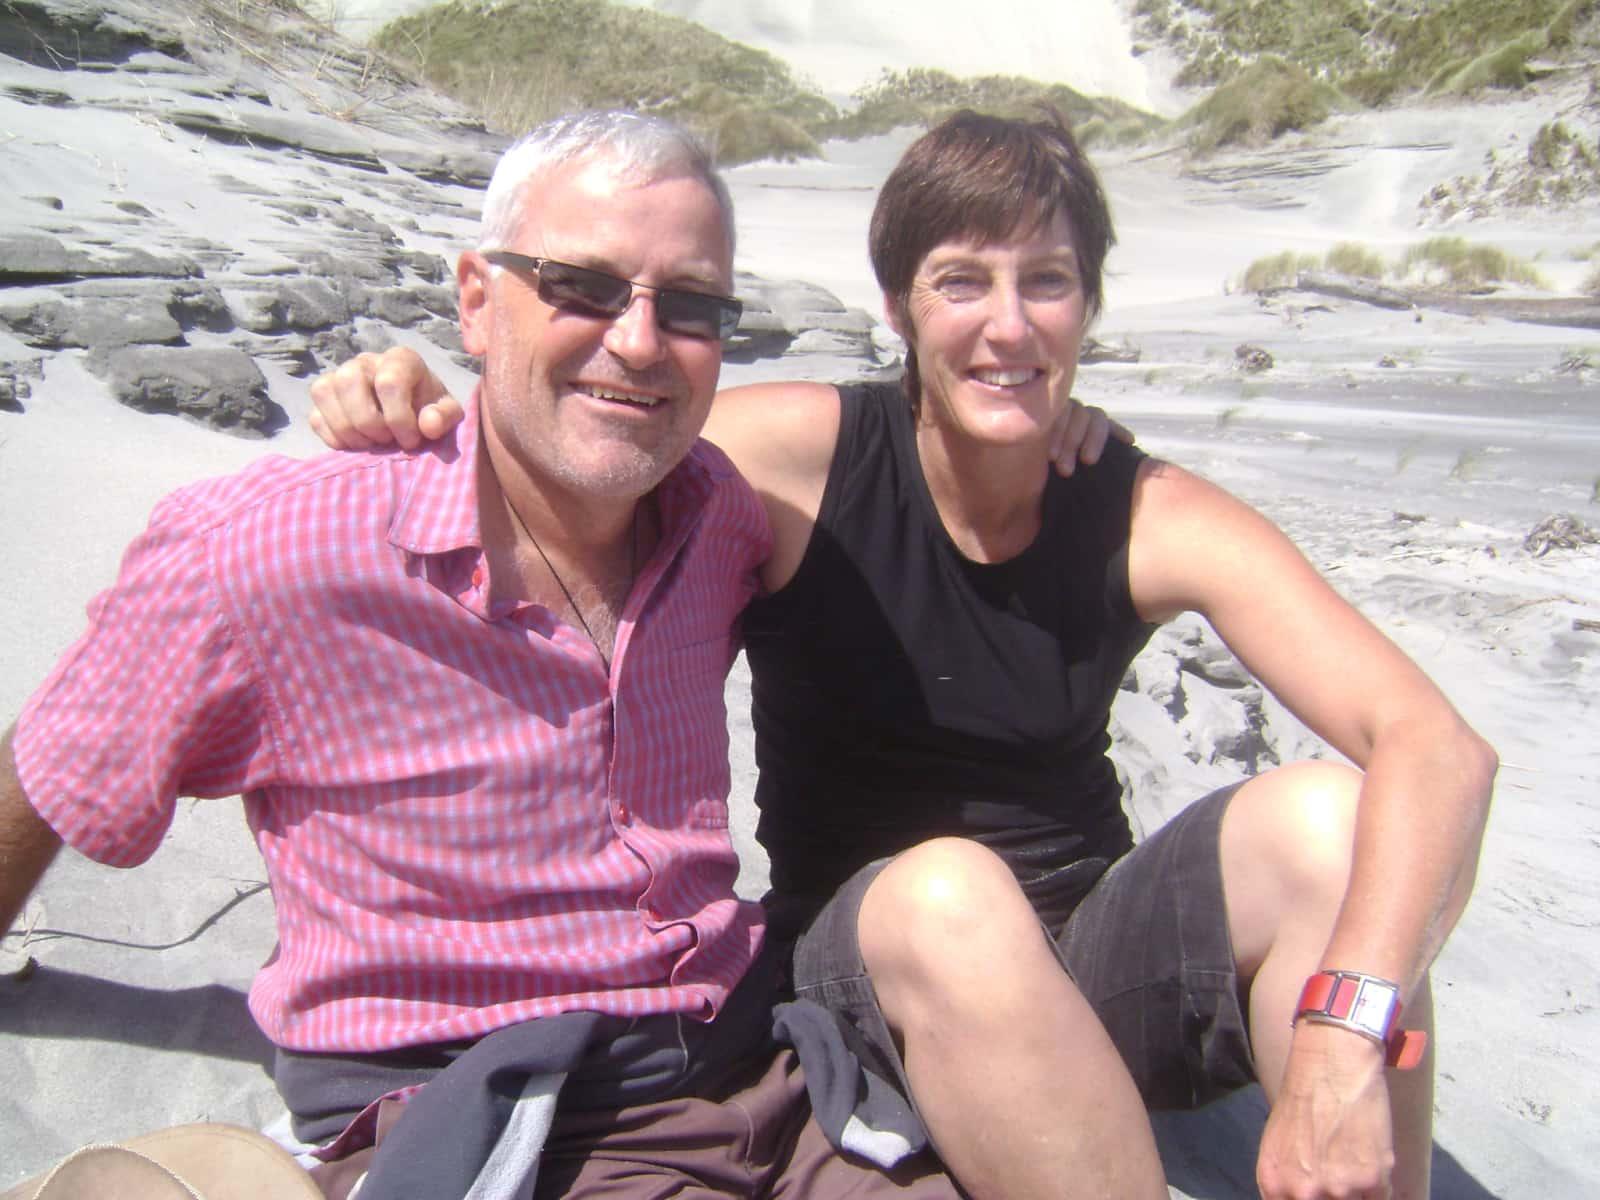 Alannah & John from Vancouver, British Columbia, Canada